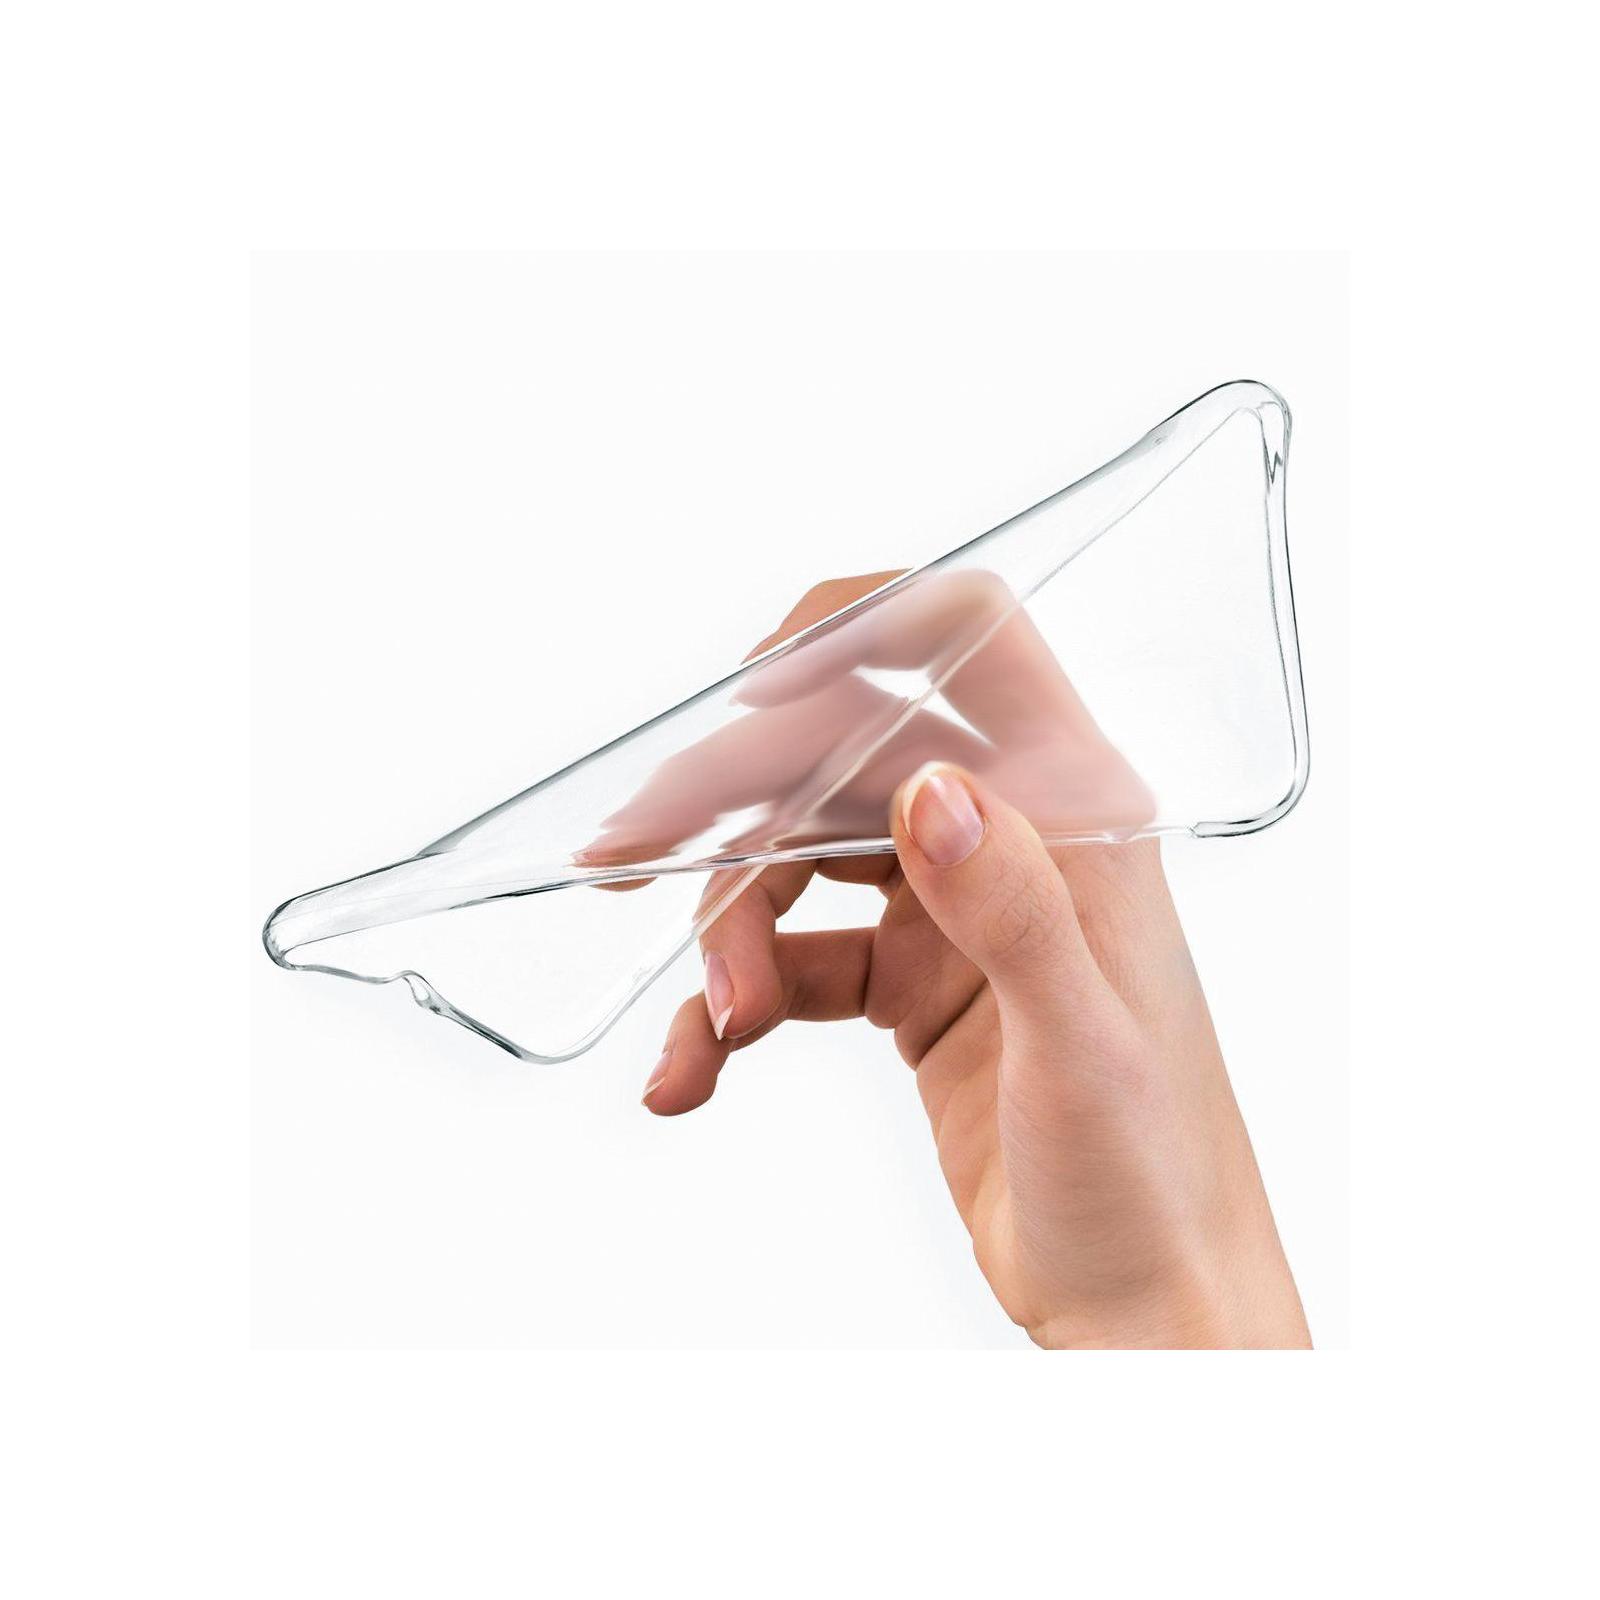 Чехол для моб. телефона SmartCase Samsung Galaxy J7 / J730 TPU Clear (SC-J730) изображение 4